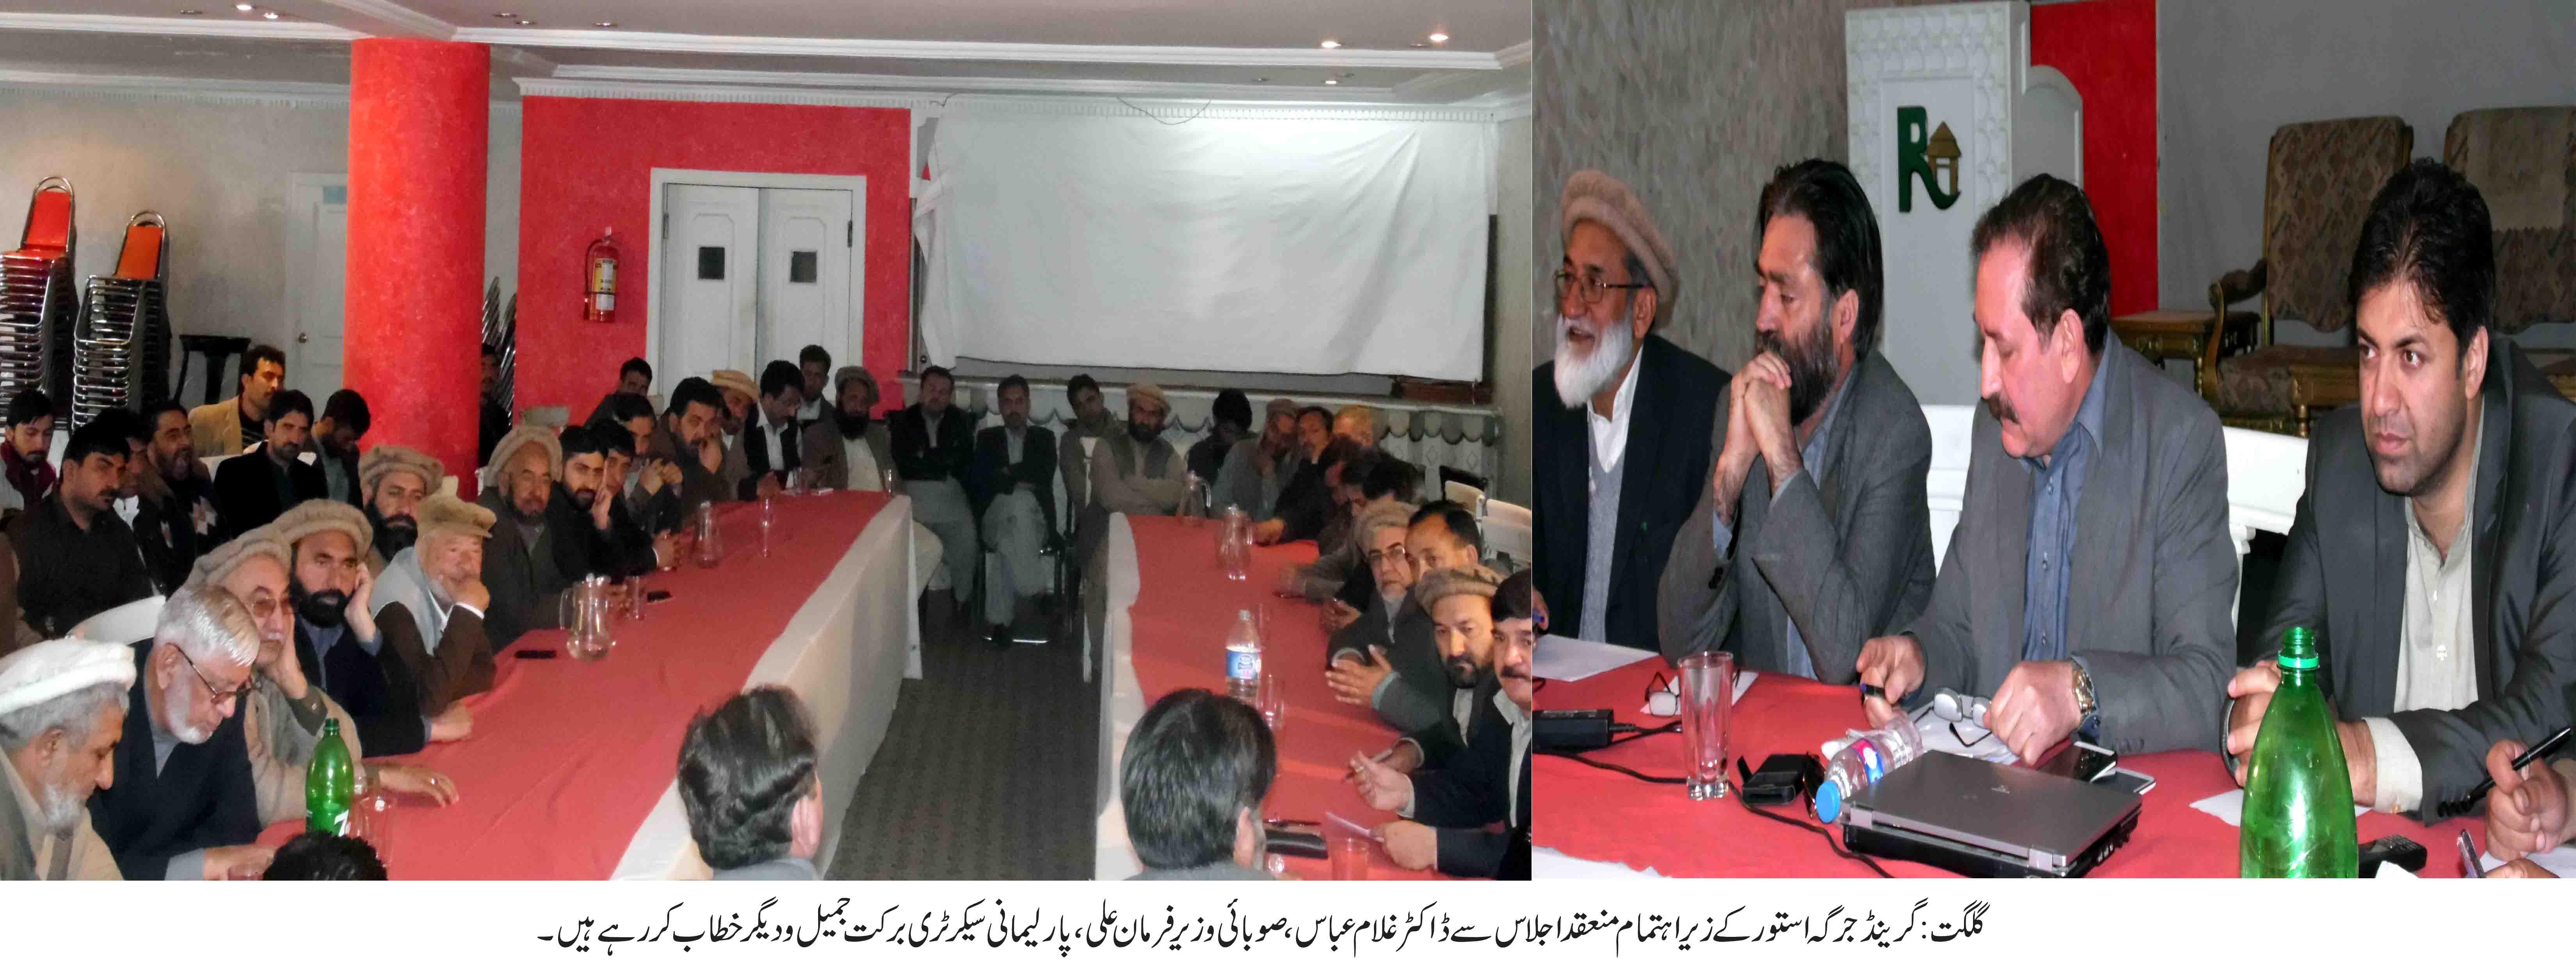 Astore Grand Jirga demands Astore as the divisional headquarter